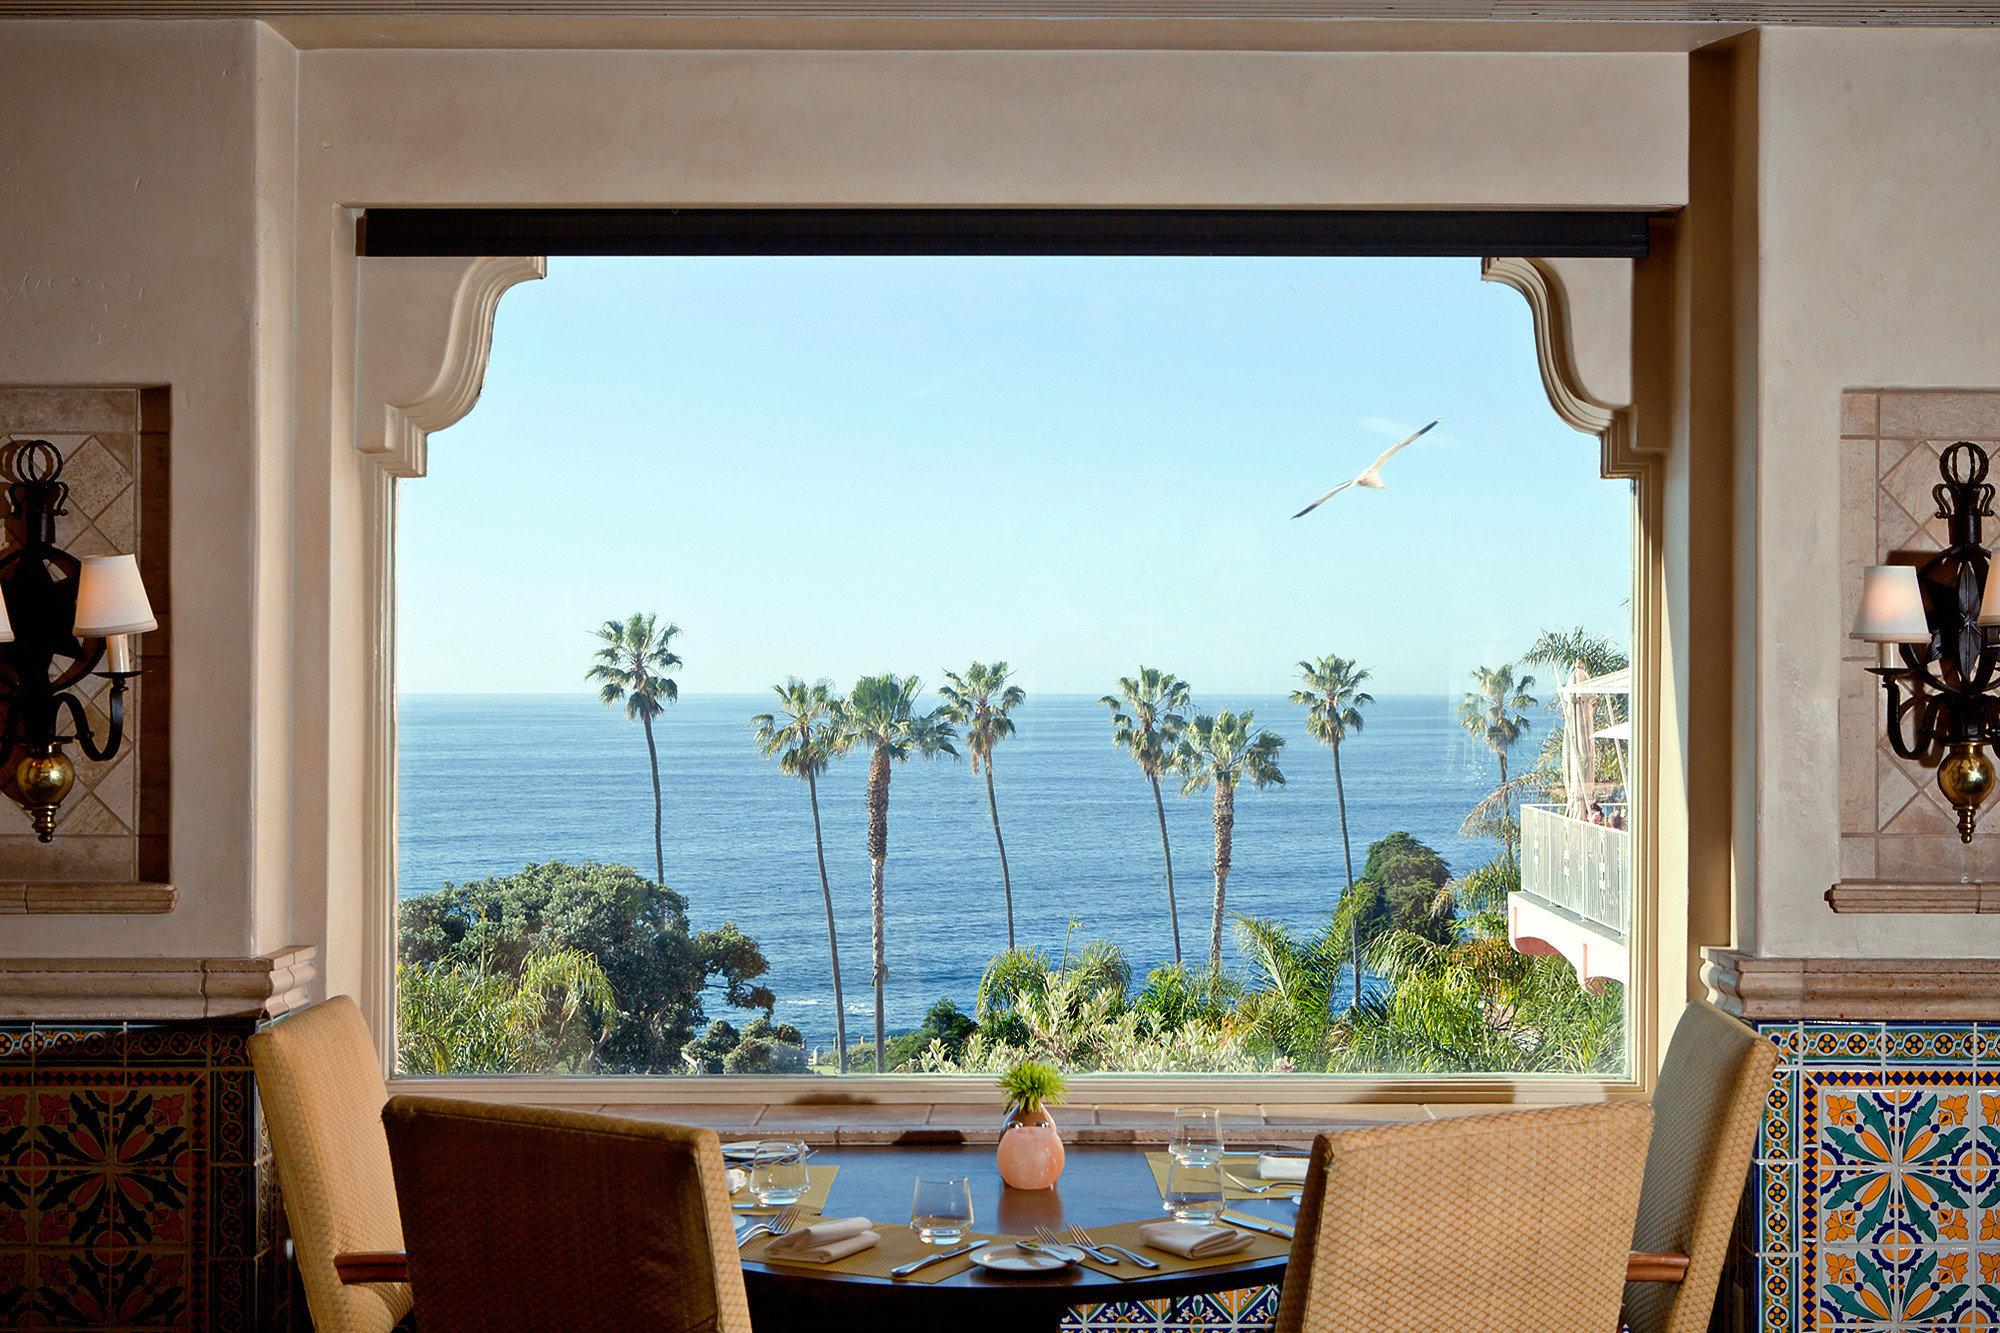 Dining Eat Elegant Hotels Luxury Tropical house property home living room mural mansion Villa cottage